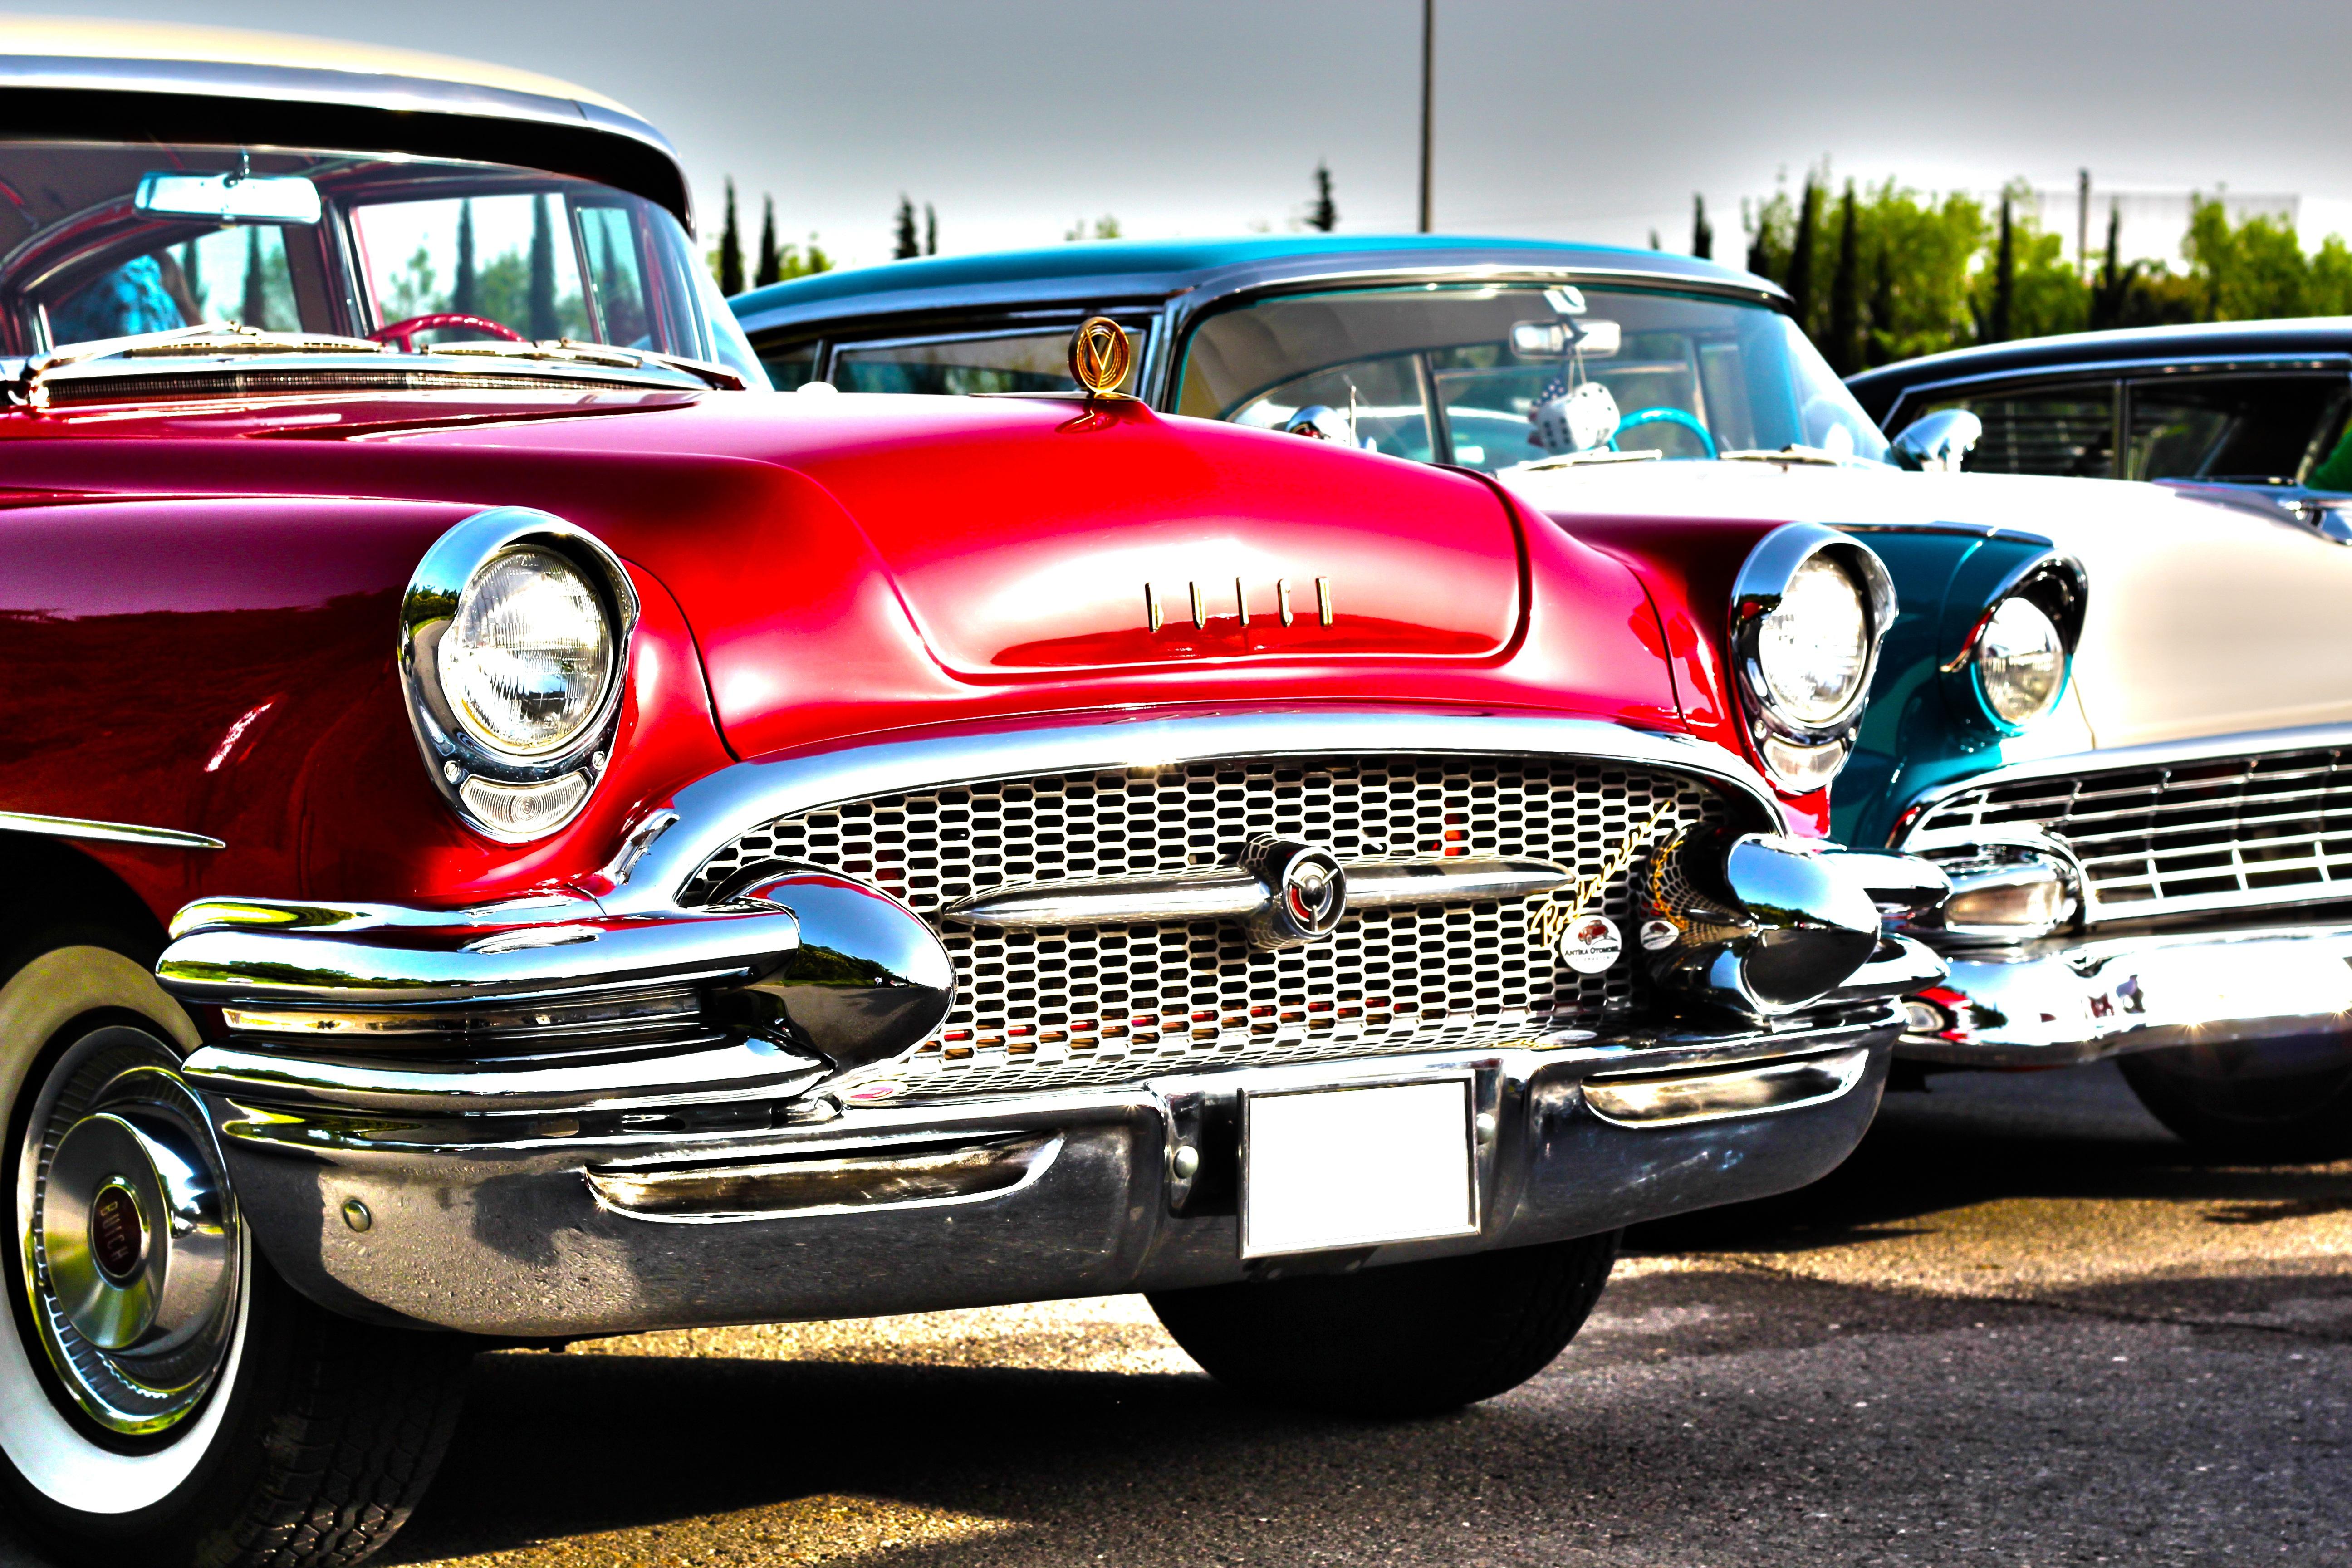 Free Images : old, red, motor vehicle, vintage car, hdr, cars ...